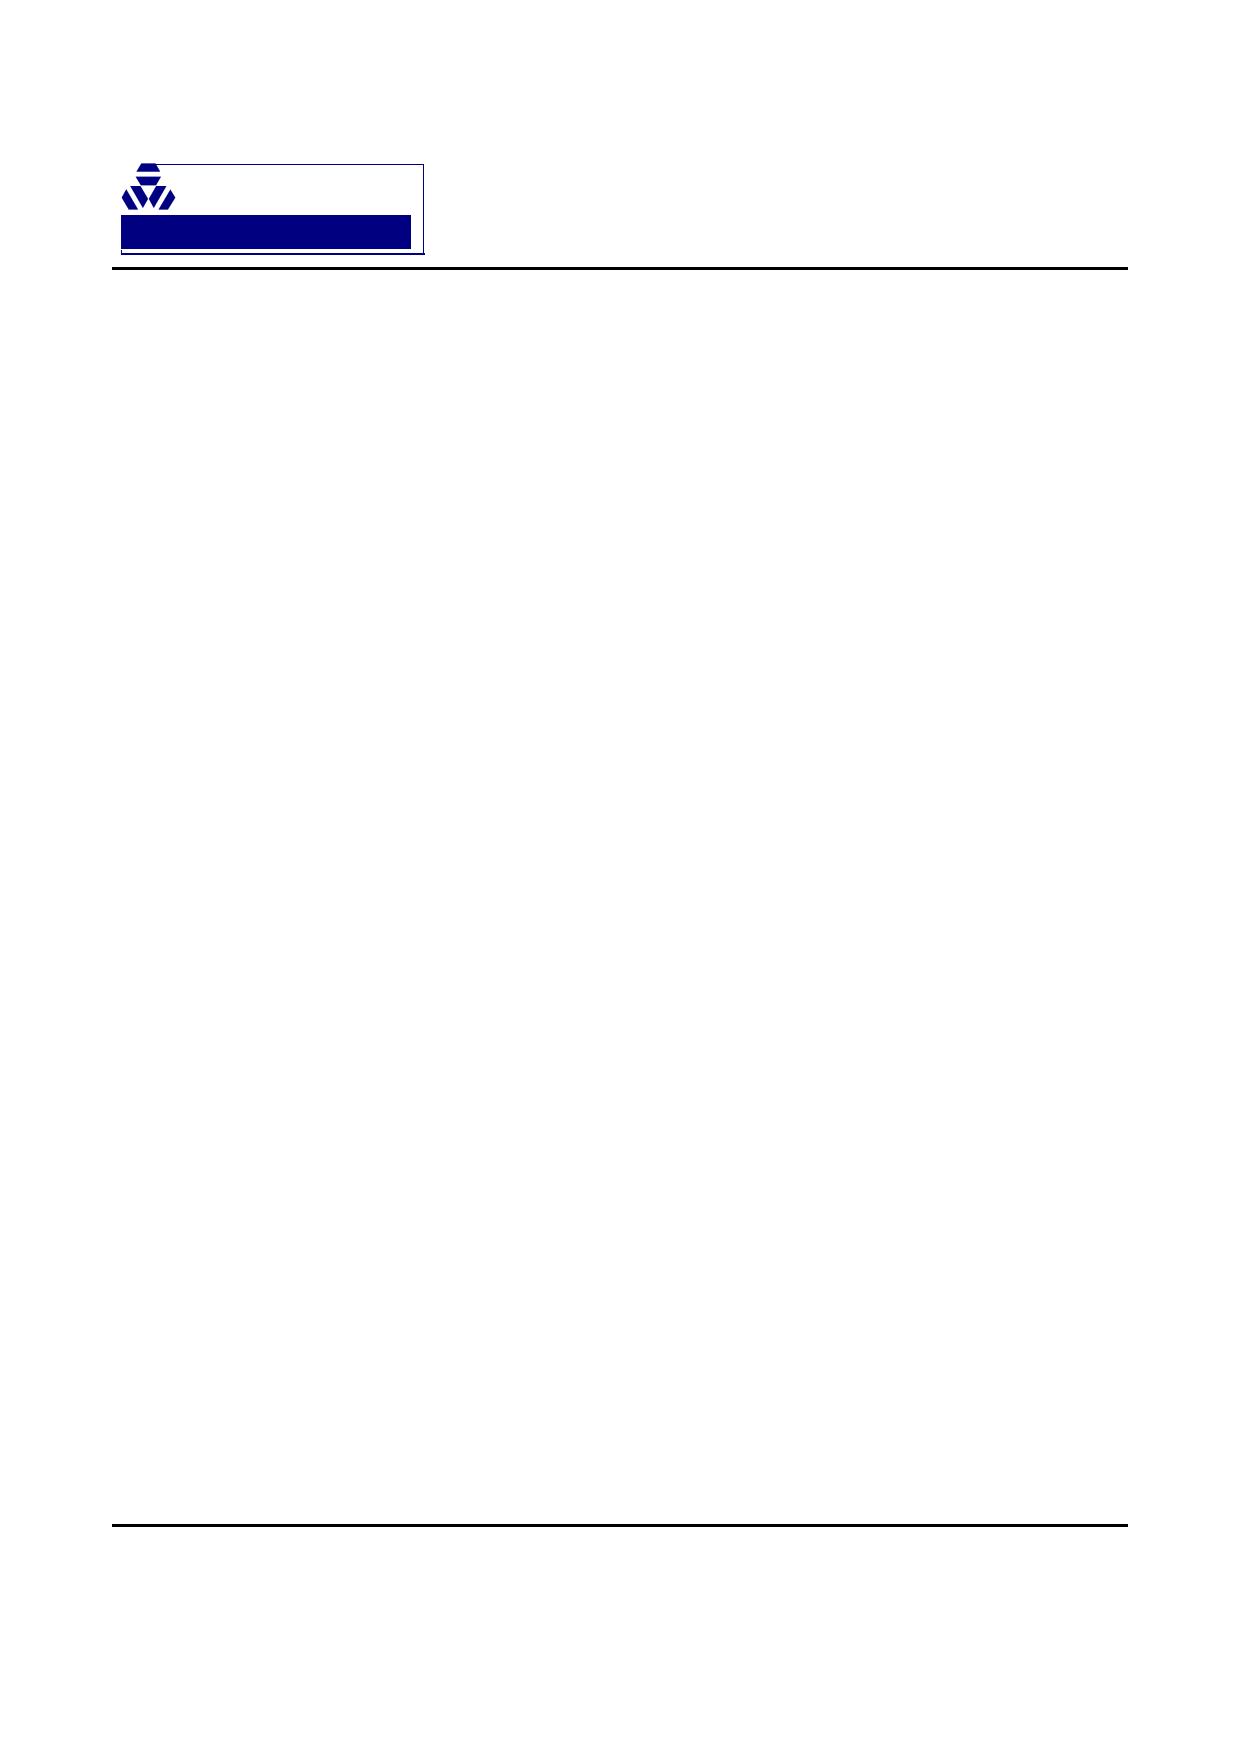 FS9952 datasheet